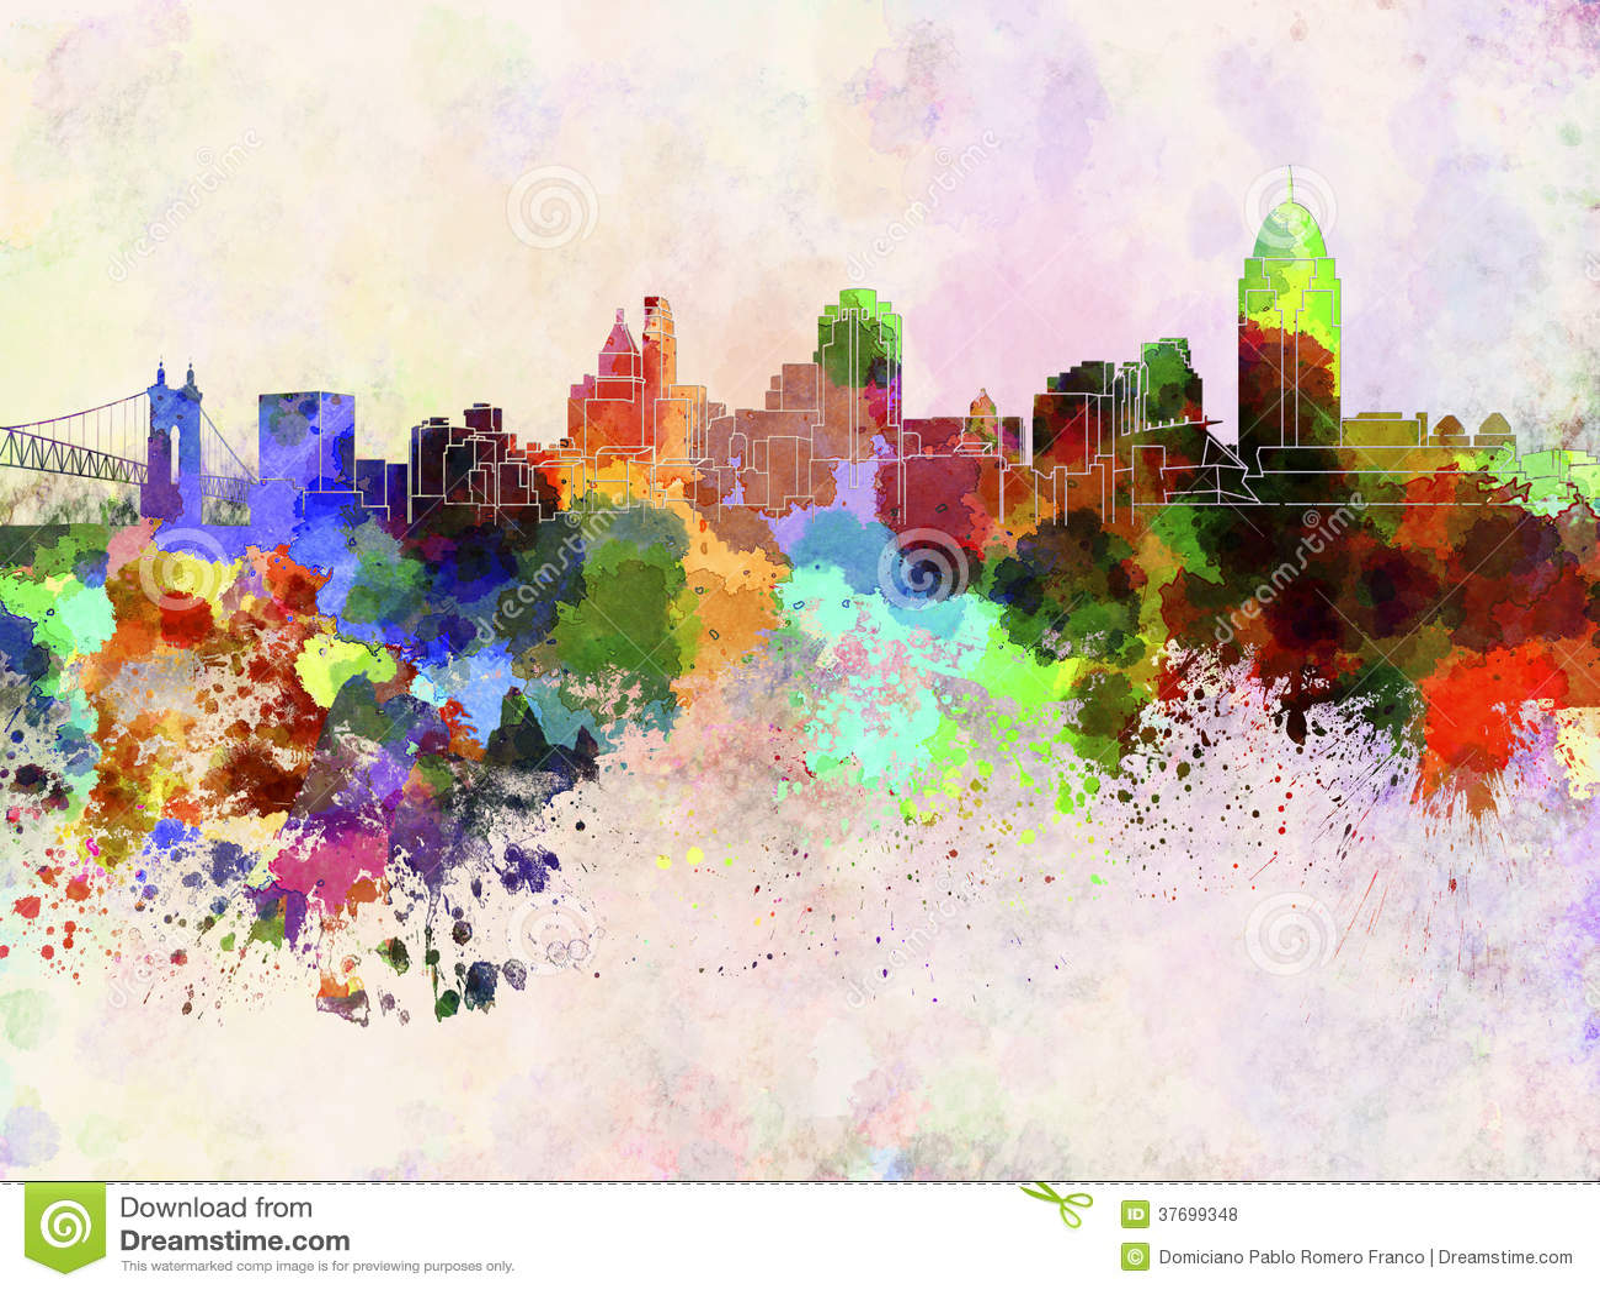 cincinnati skyline in watercolor background royalty free stock photos